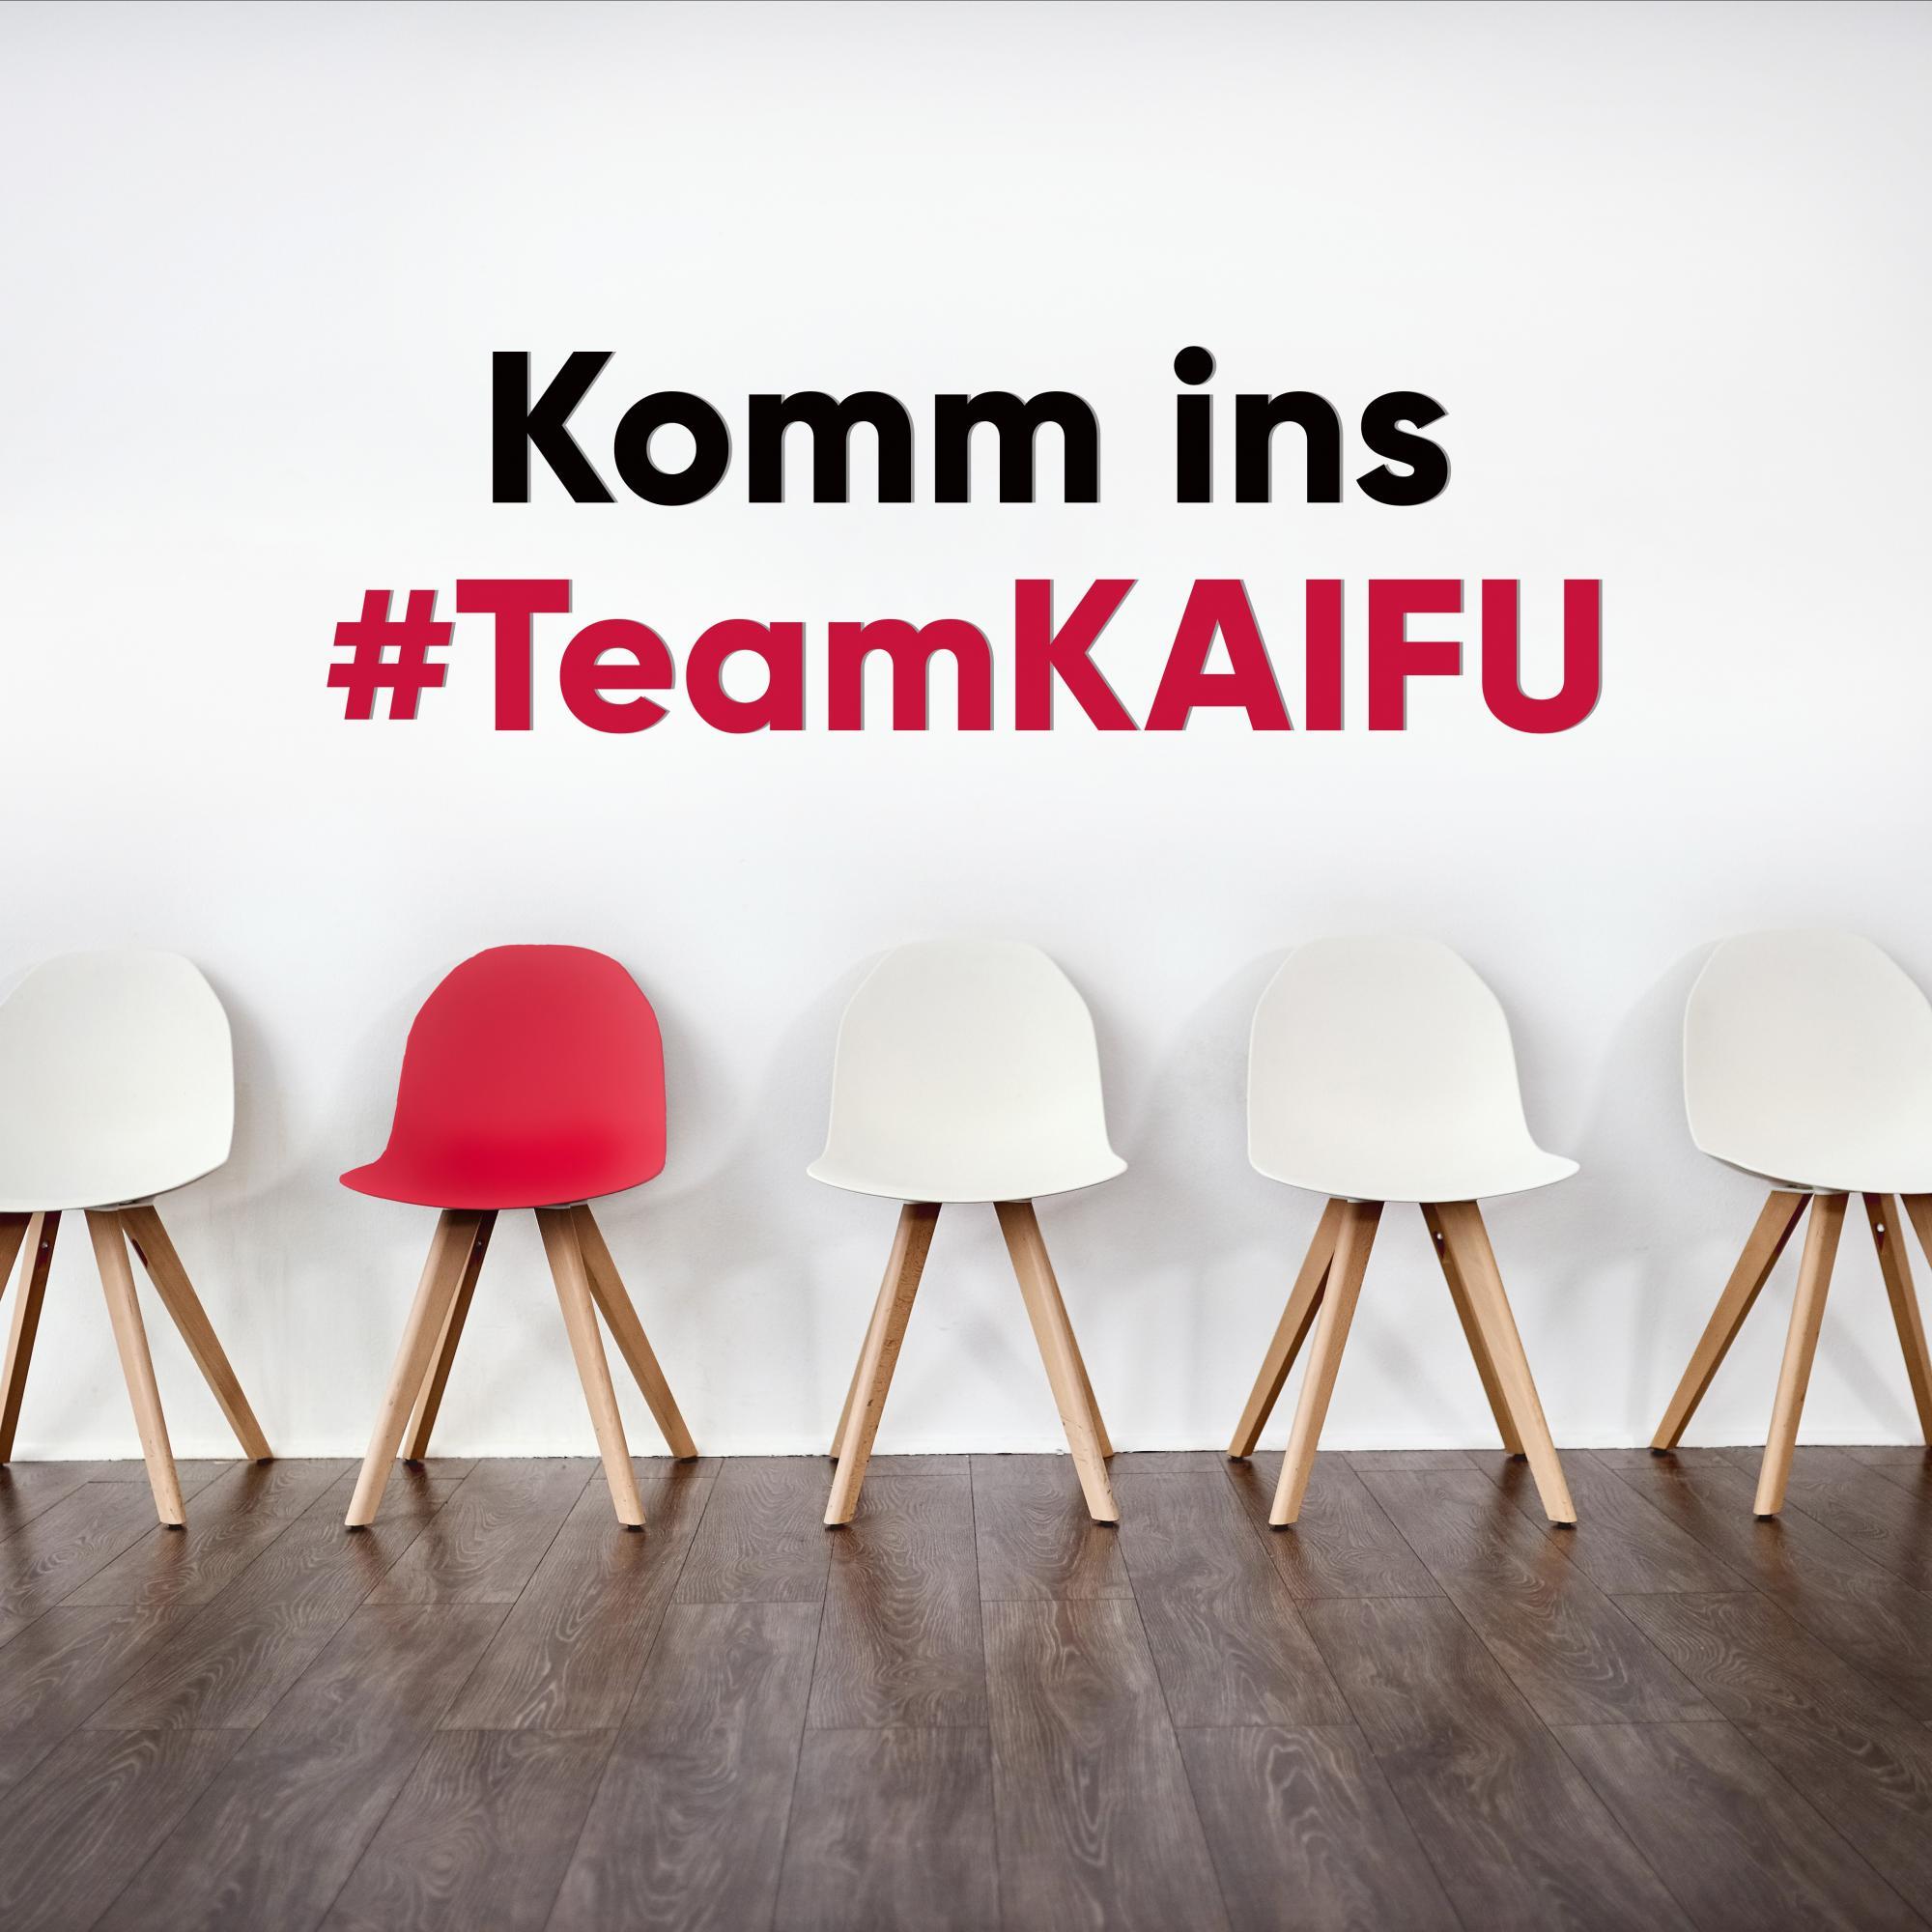 Komm ins Team KAIFU